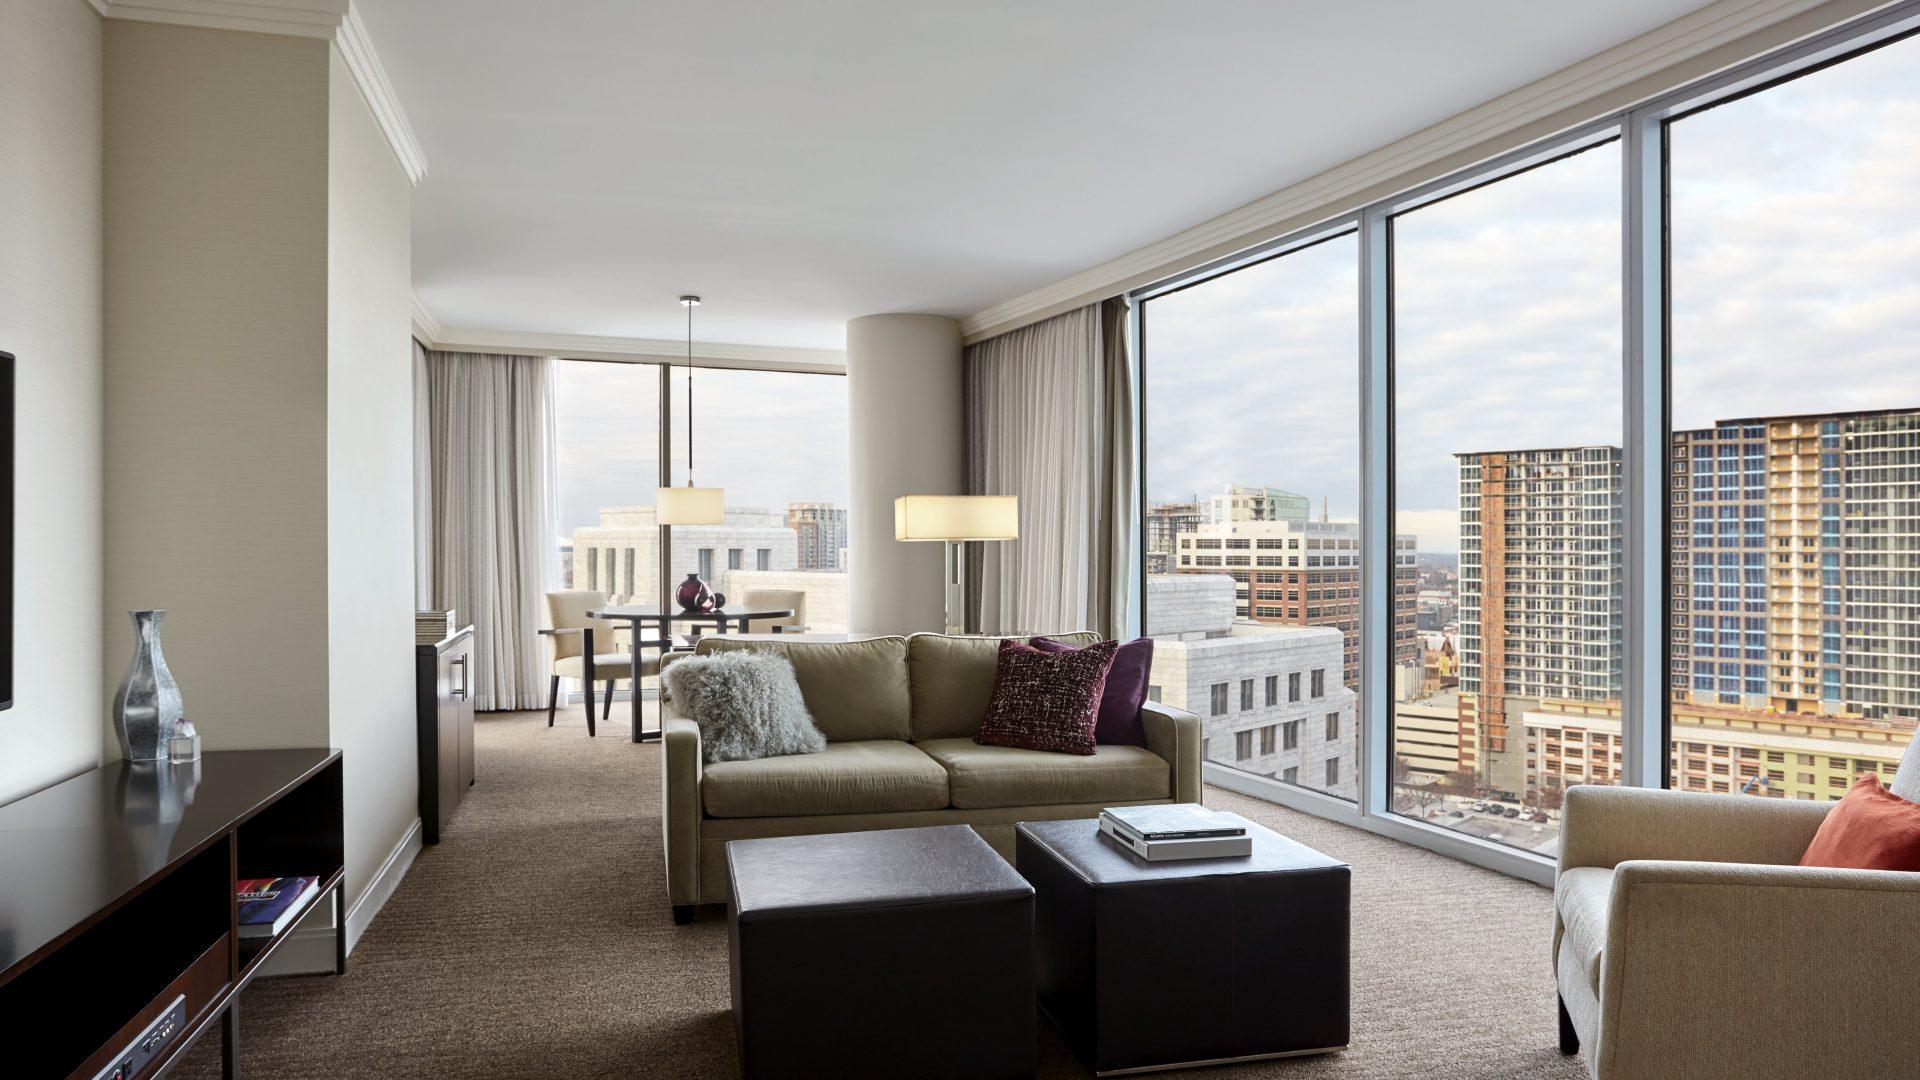 Hotel With Hot Tub In Room Atlanta Ga